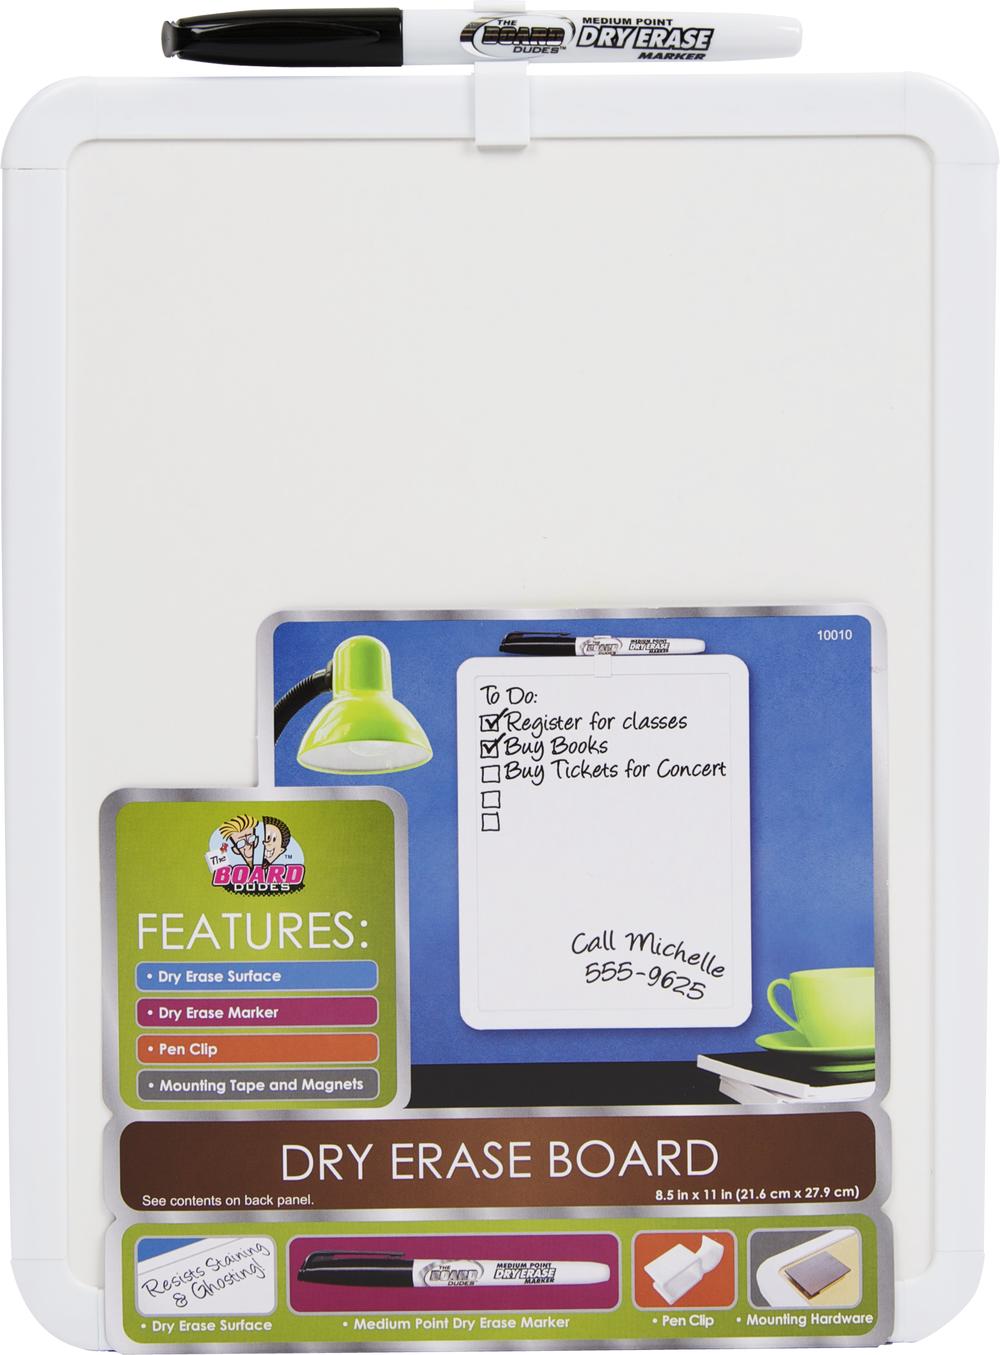 Board Dudes Plastic Framed Dry-Erase Board - White 8.5x11 Bulk